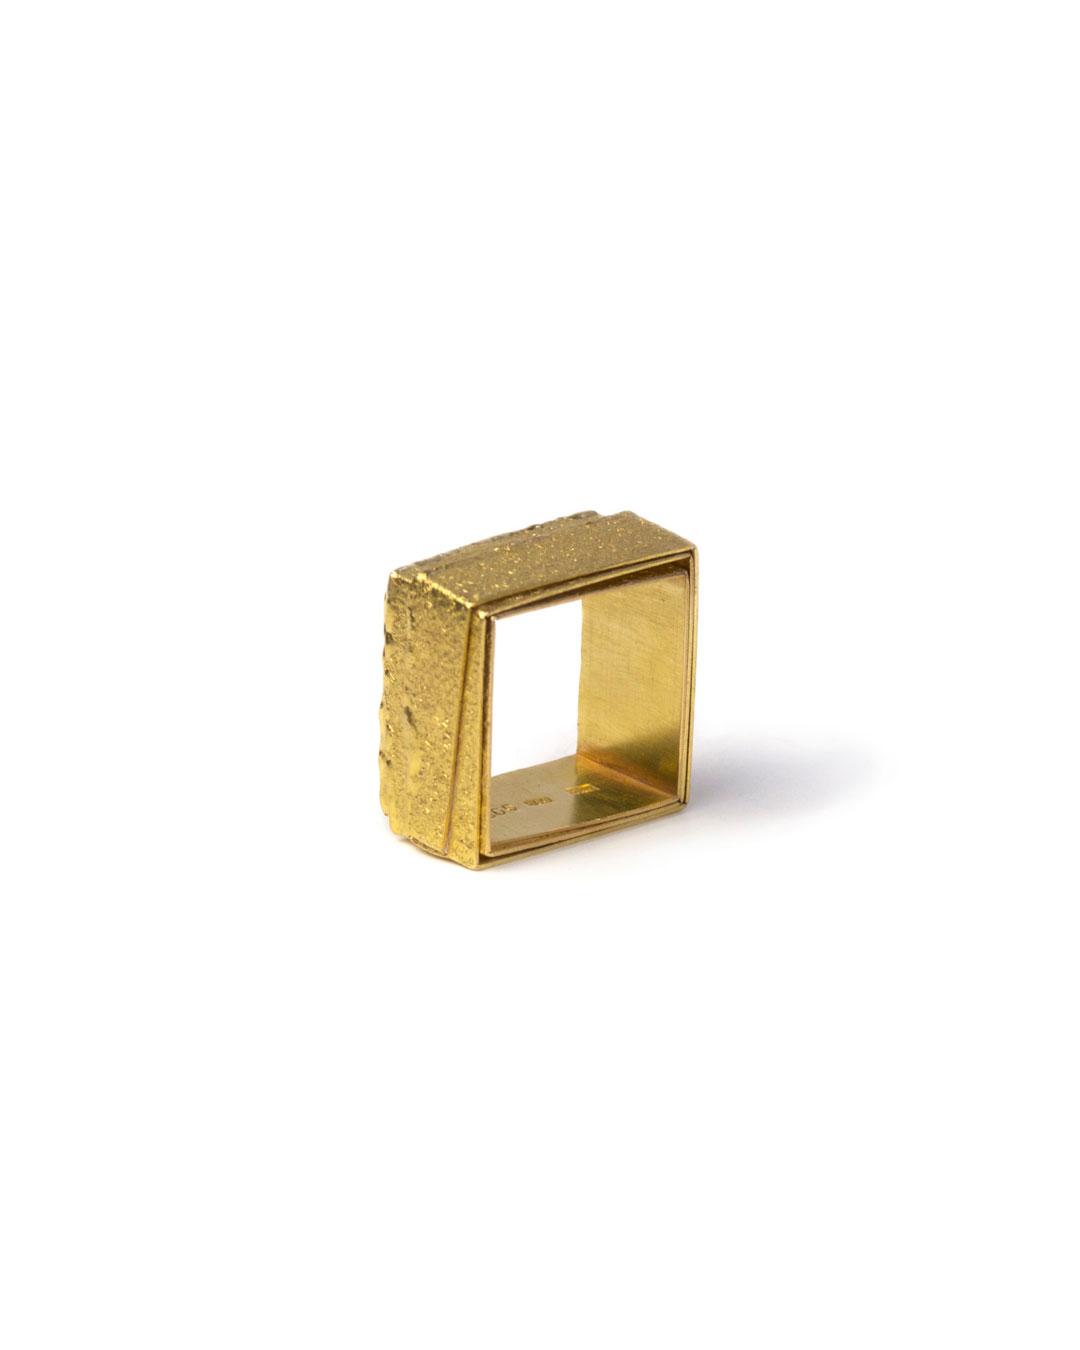 Okinari Kurokawa, untitled, 1998, ring; 18ct gold, 20 x 20  x 12 mm, €1600